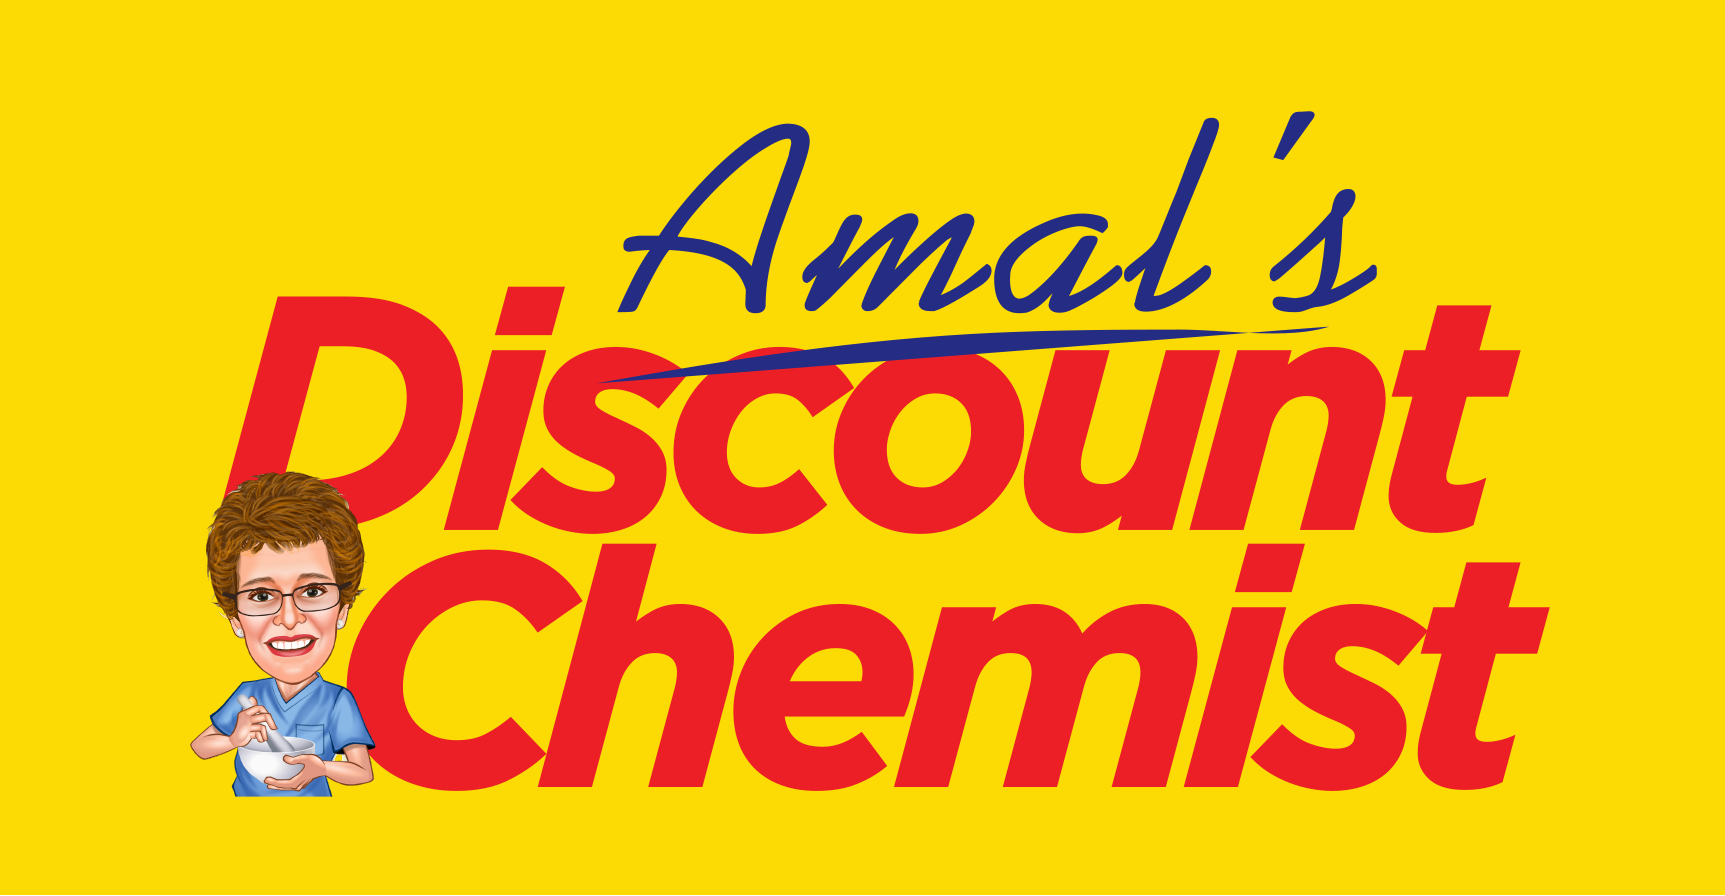 Amal's Discount Chemist